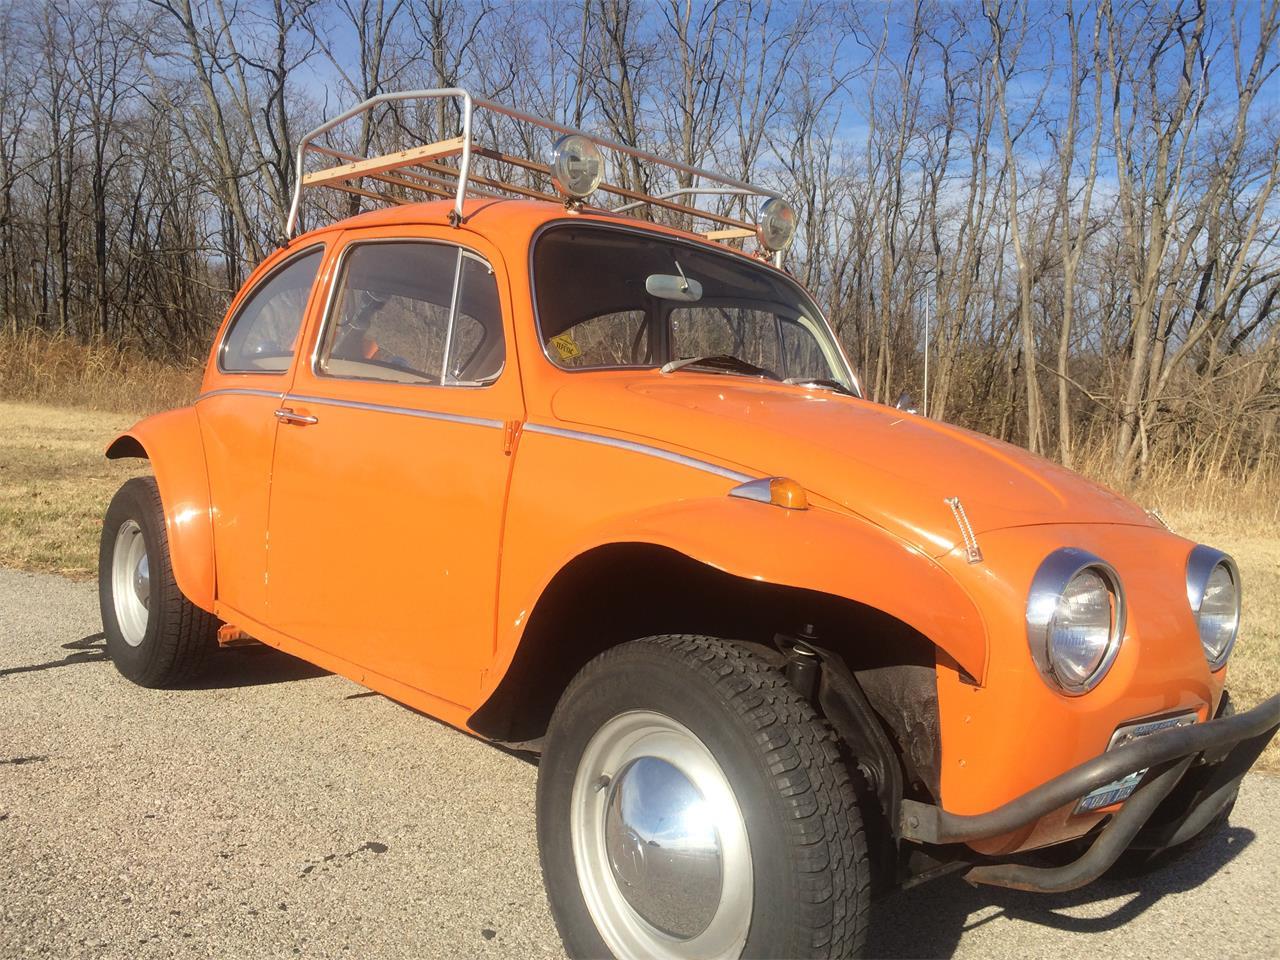 1966 Volkswagen Beetle For Sale Classiccars Com Cc 760204